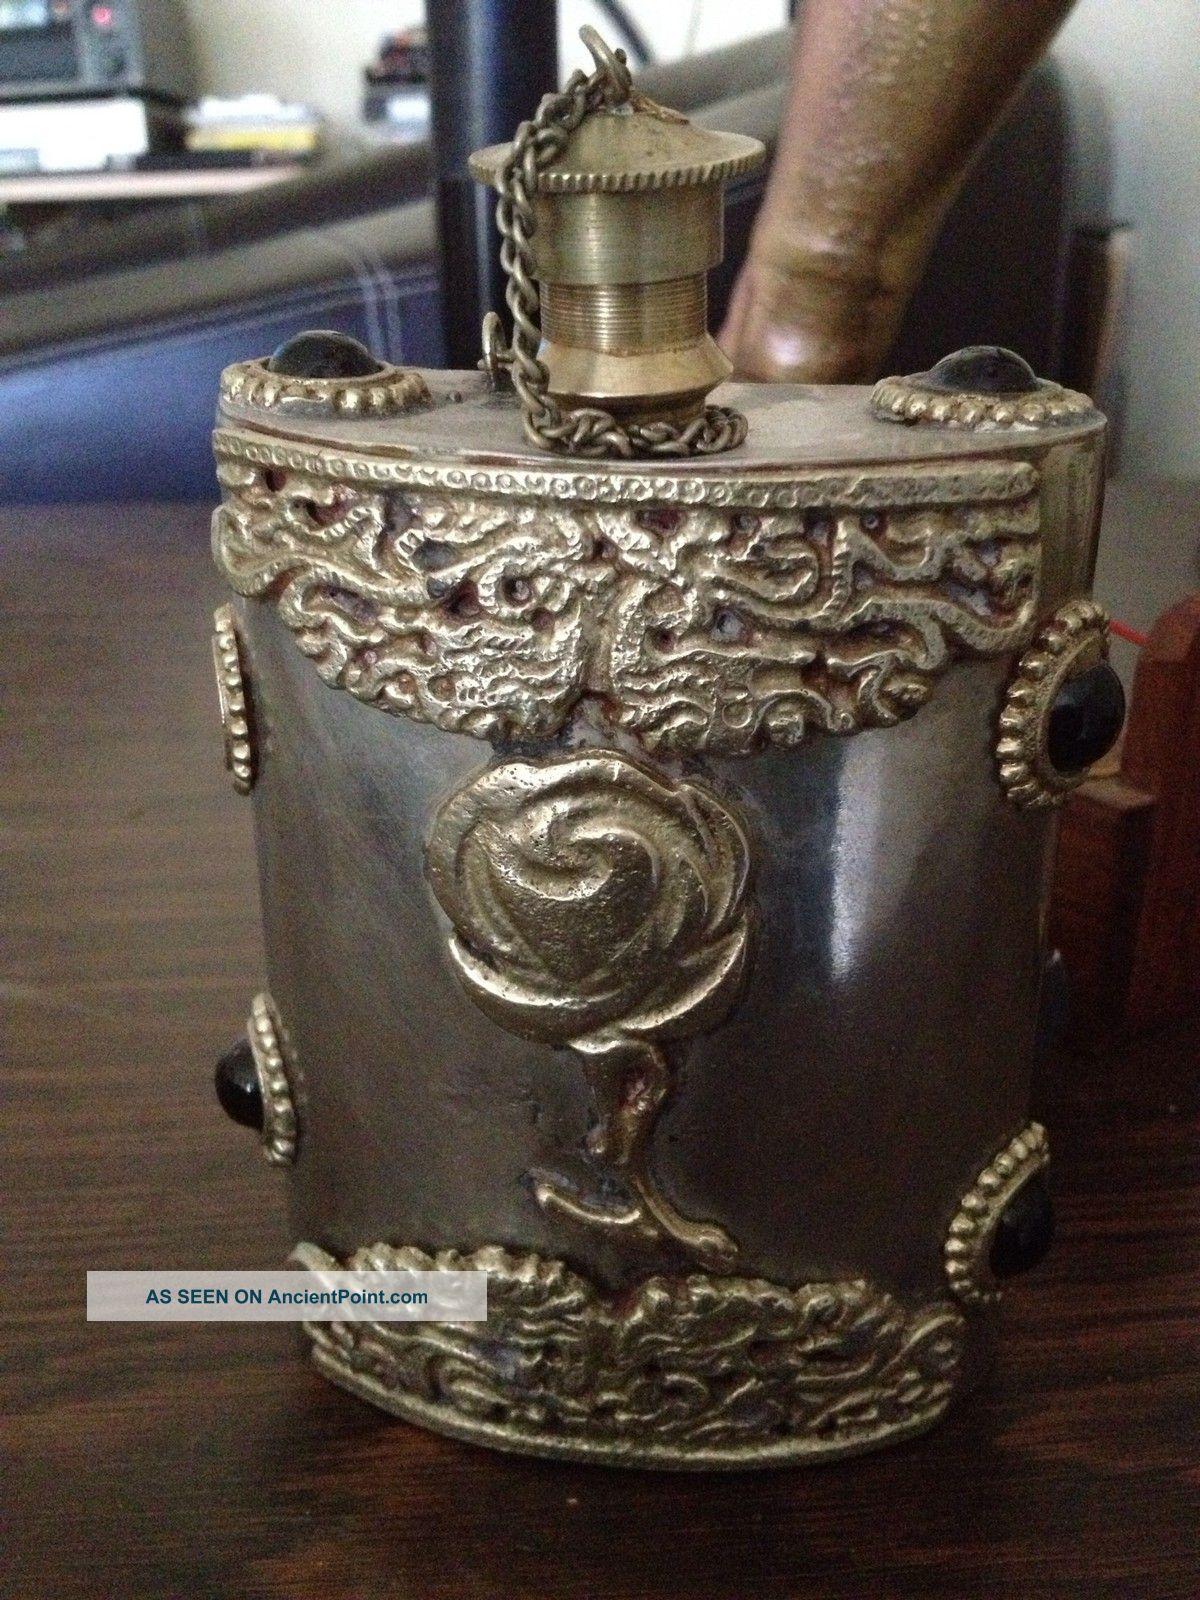 Vintage Sterling Silver Flask With Hand Carved Details Bottles, Decanters & Flasks photo